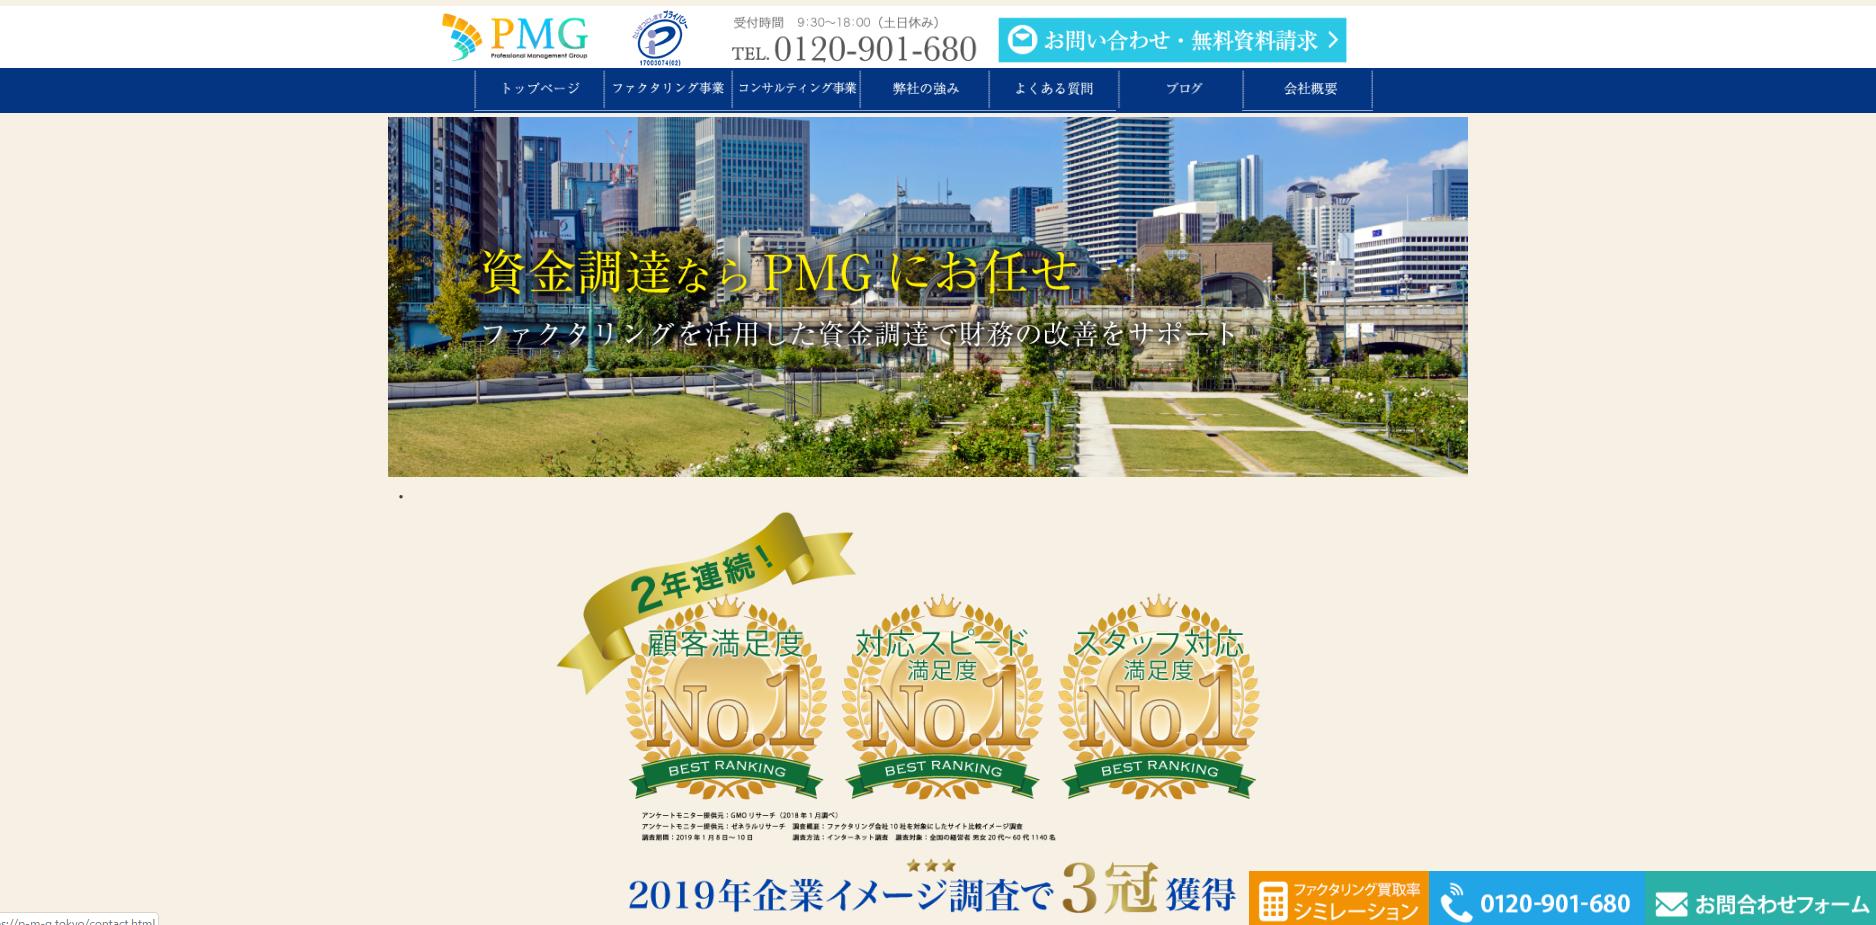 PMG ピージーエムファクタリング会社イメージ